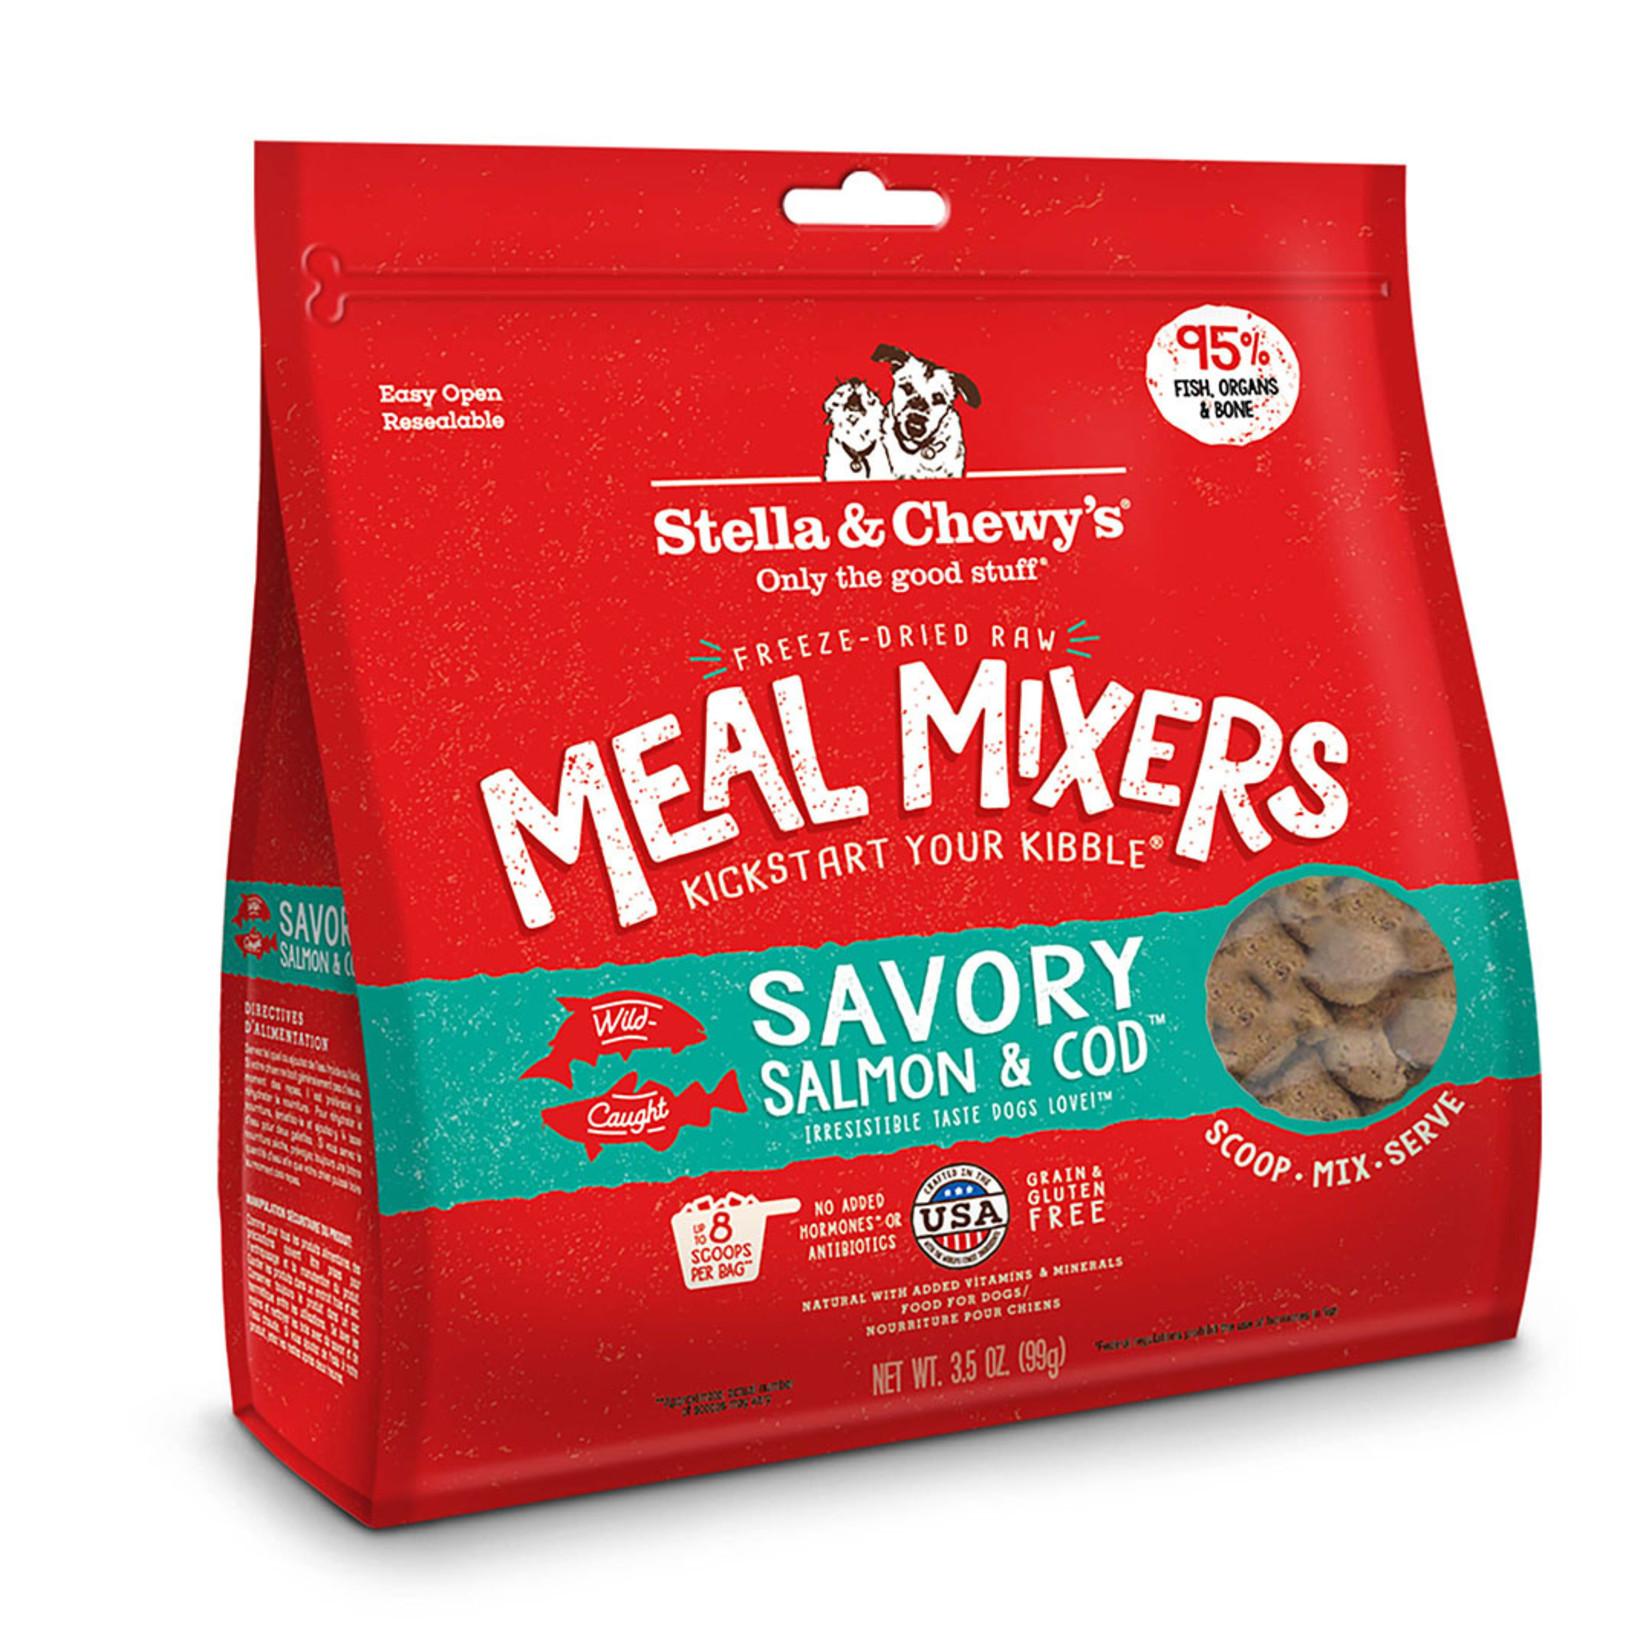 Stella & Chewys Stella Freeze-Dried Dog Meal Mixers Salmon & Cod 3.5 OZ